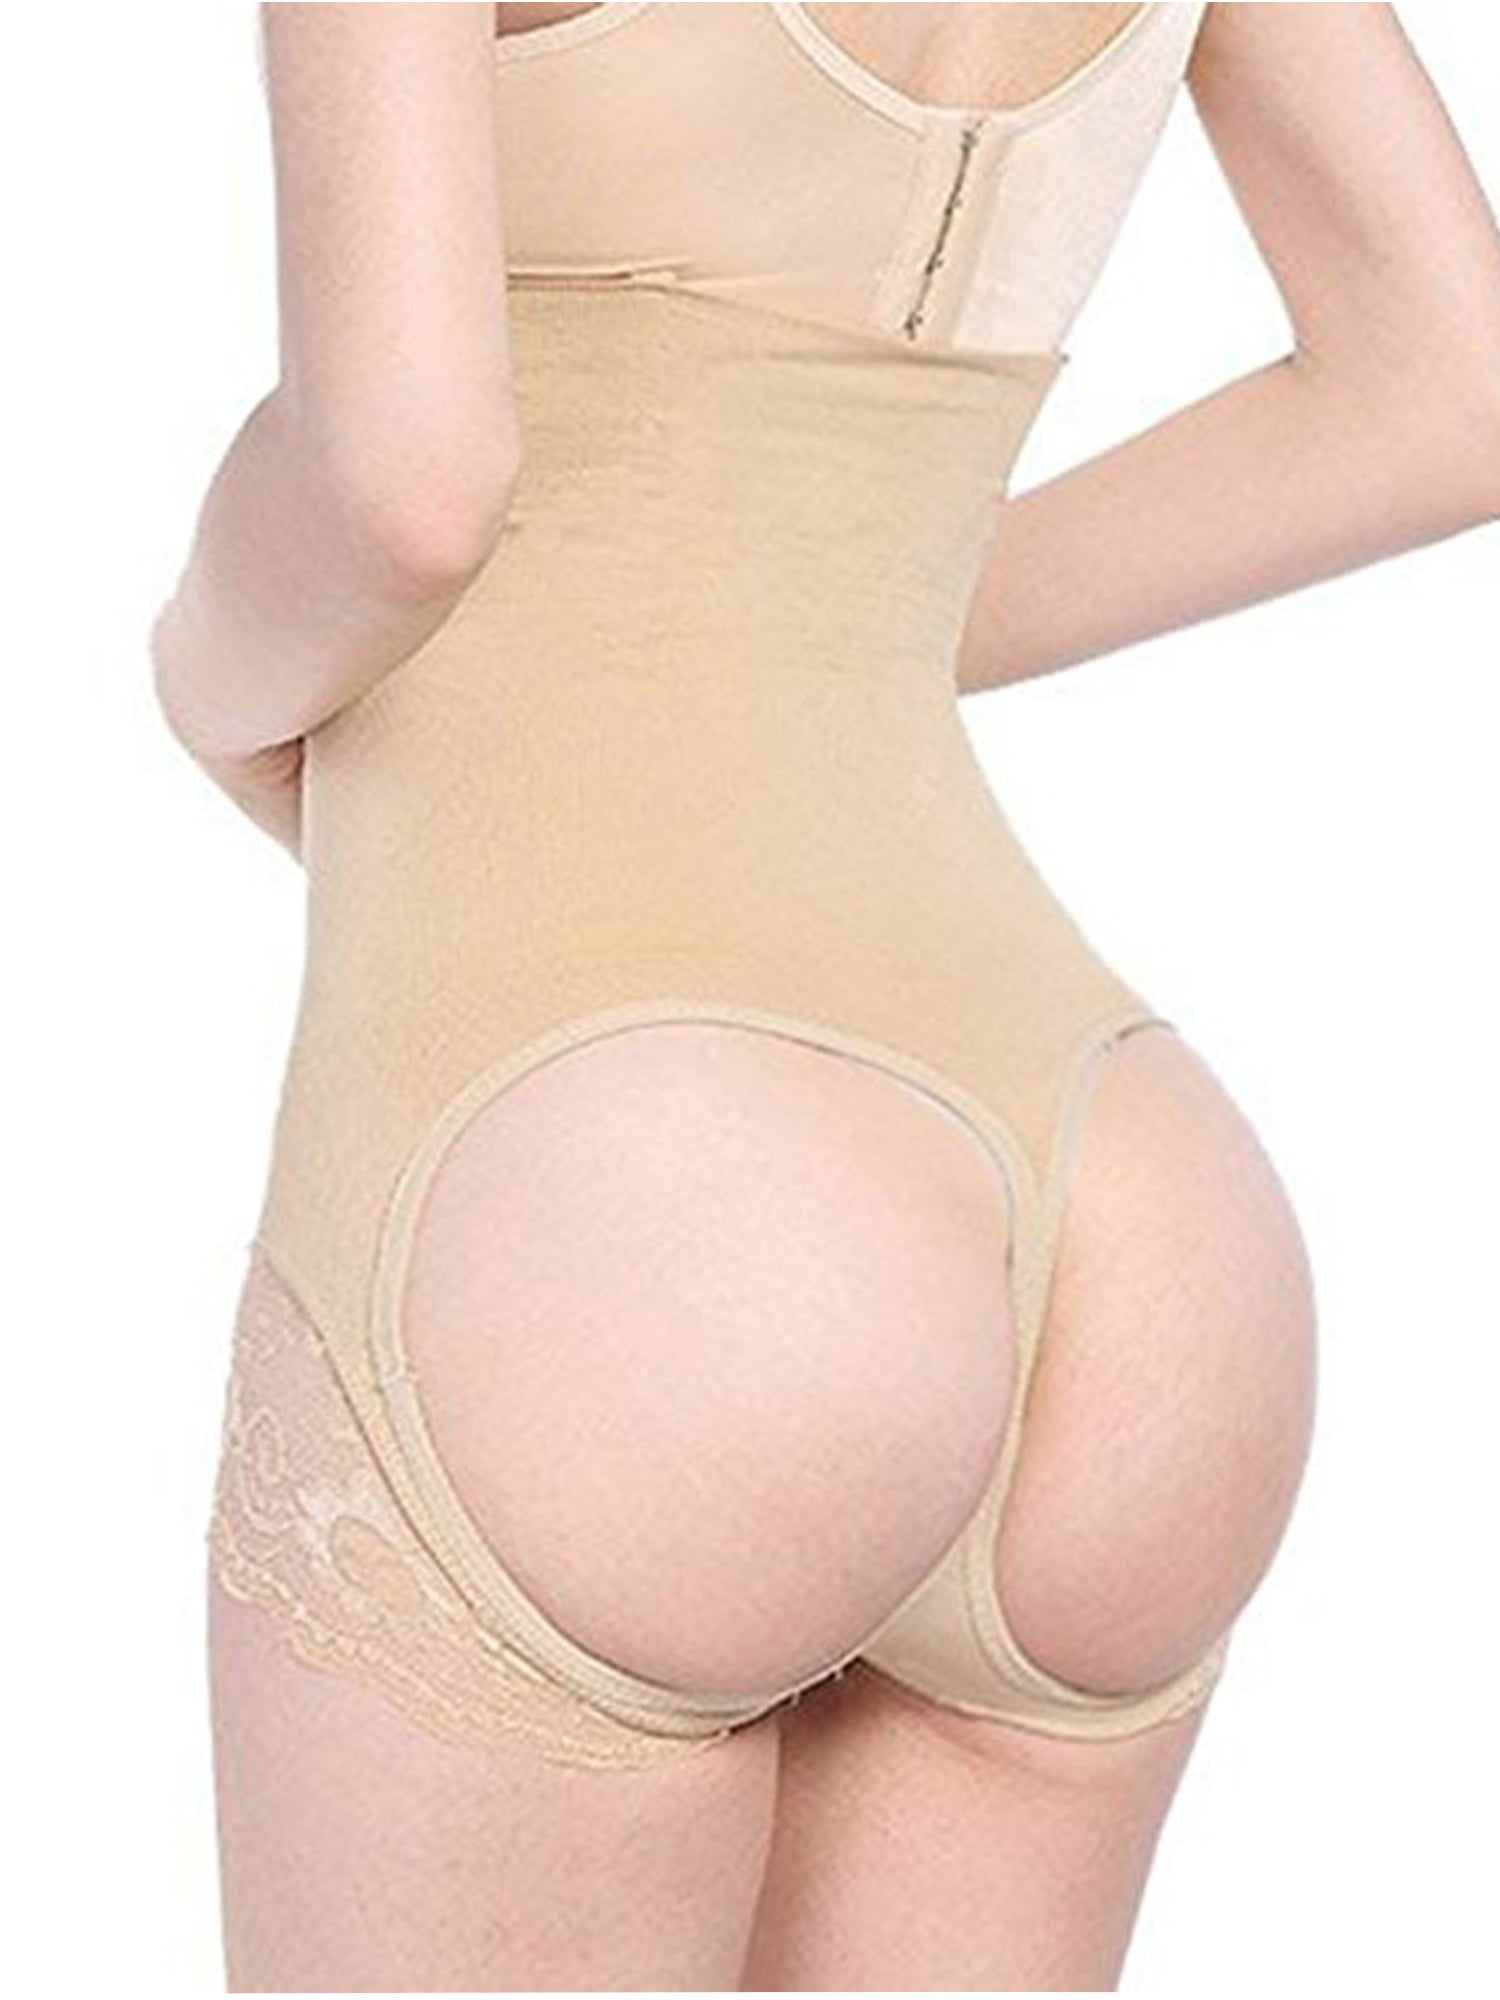 08b0a5273ca Lelinta - LELINTA Women s Butt Lift Booster Booty Lifter Control Panty  Shapewear Sexy Enhancer Booster Body Shaping - Walmart.com